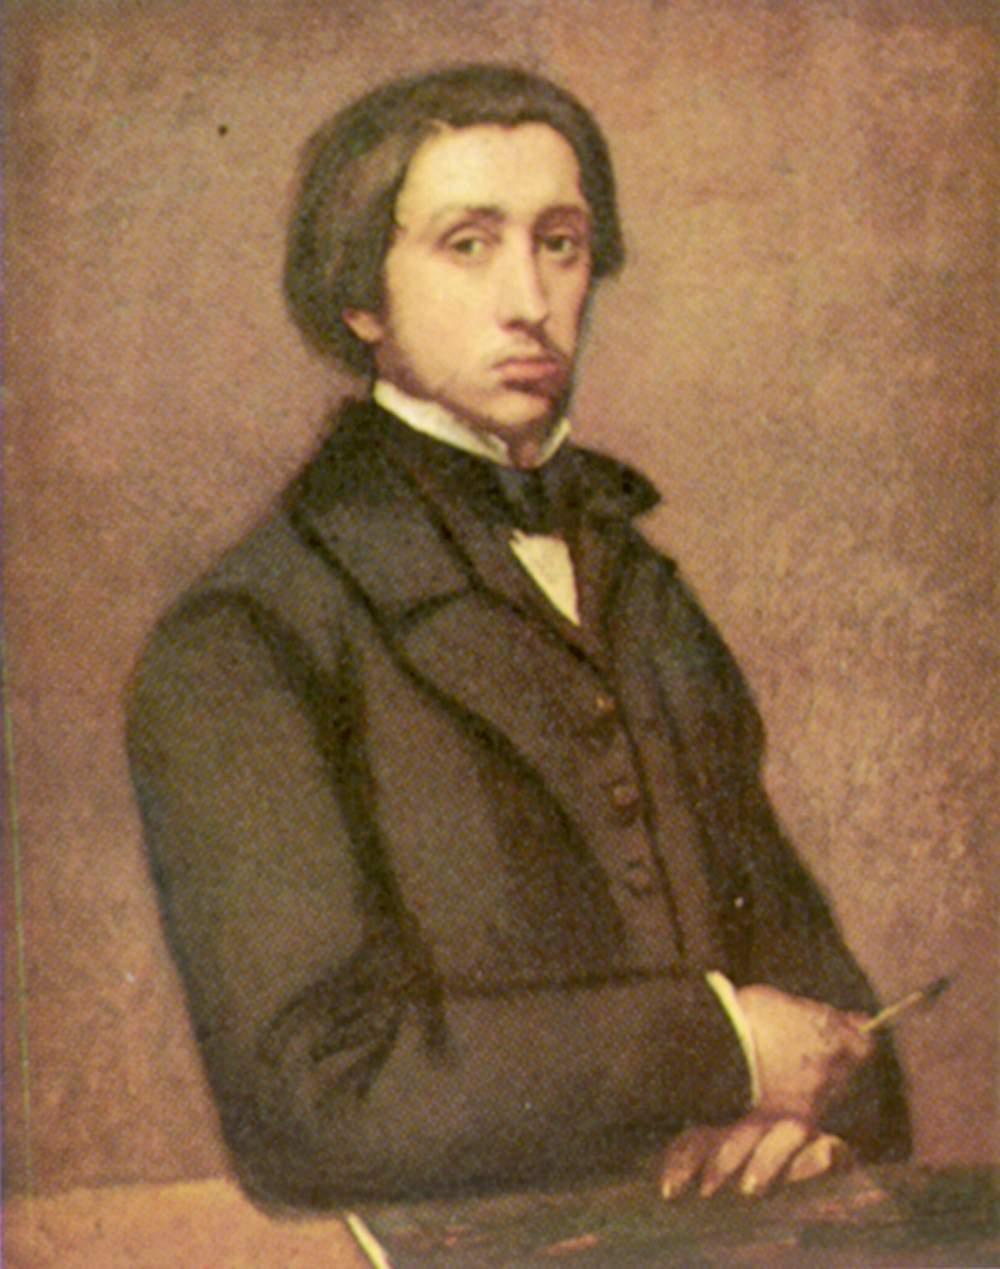 Hilaire-Germain-Edgar Degas